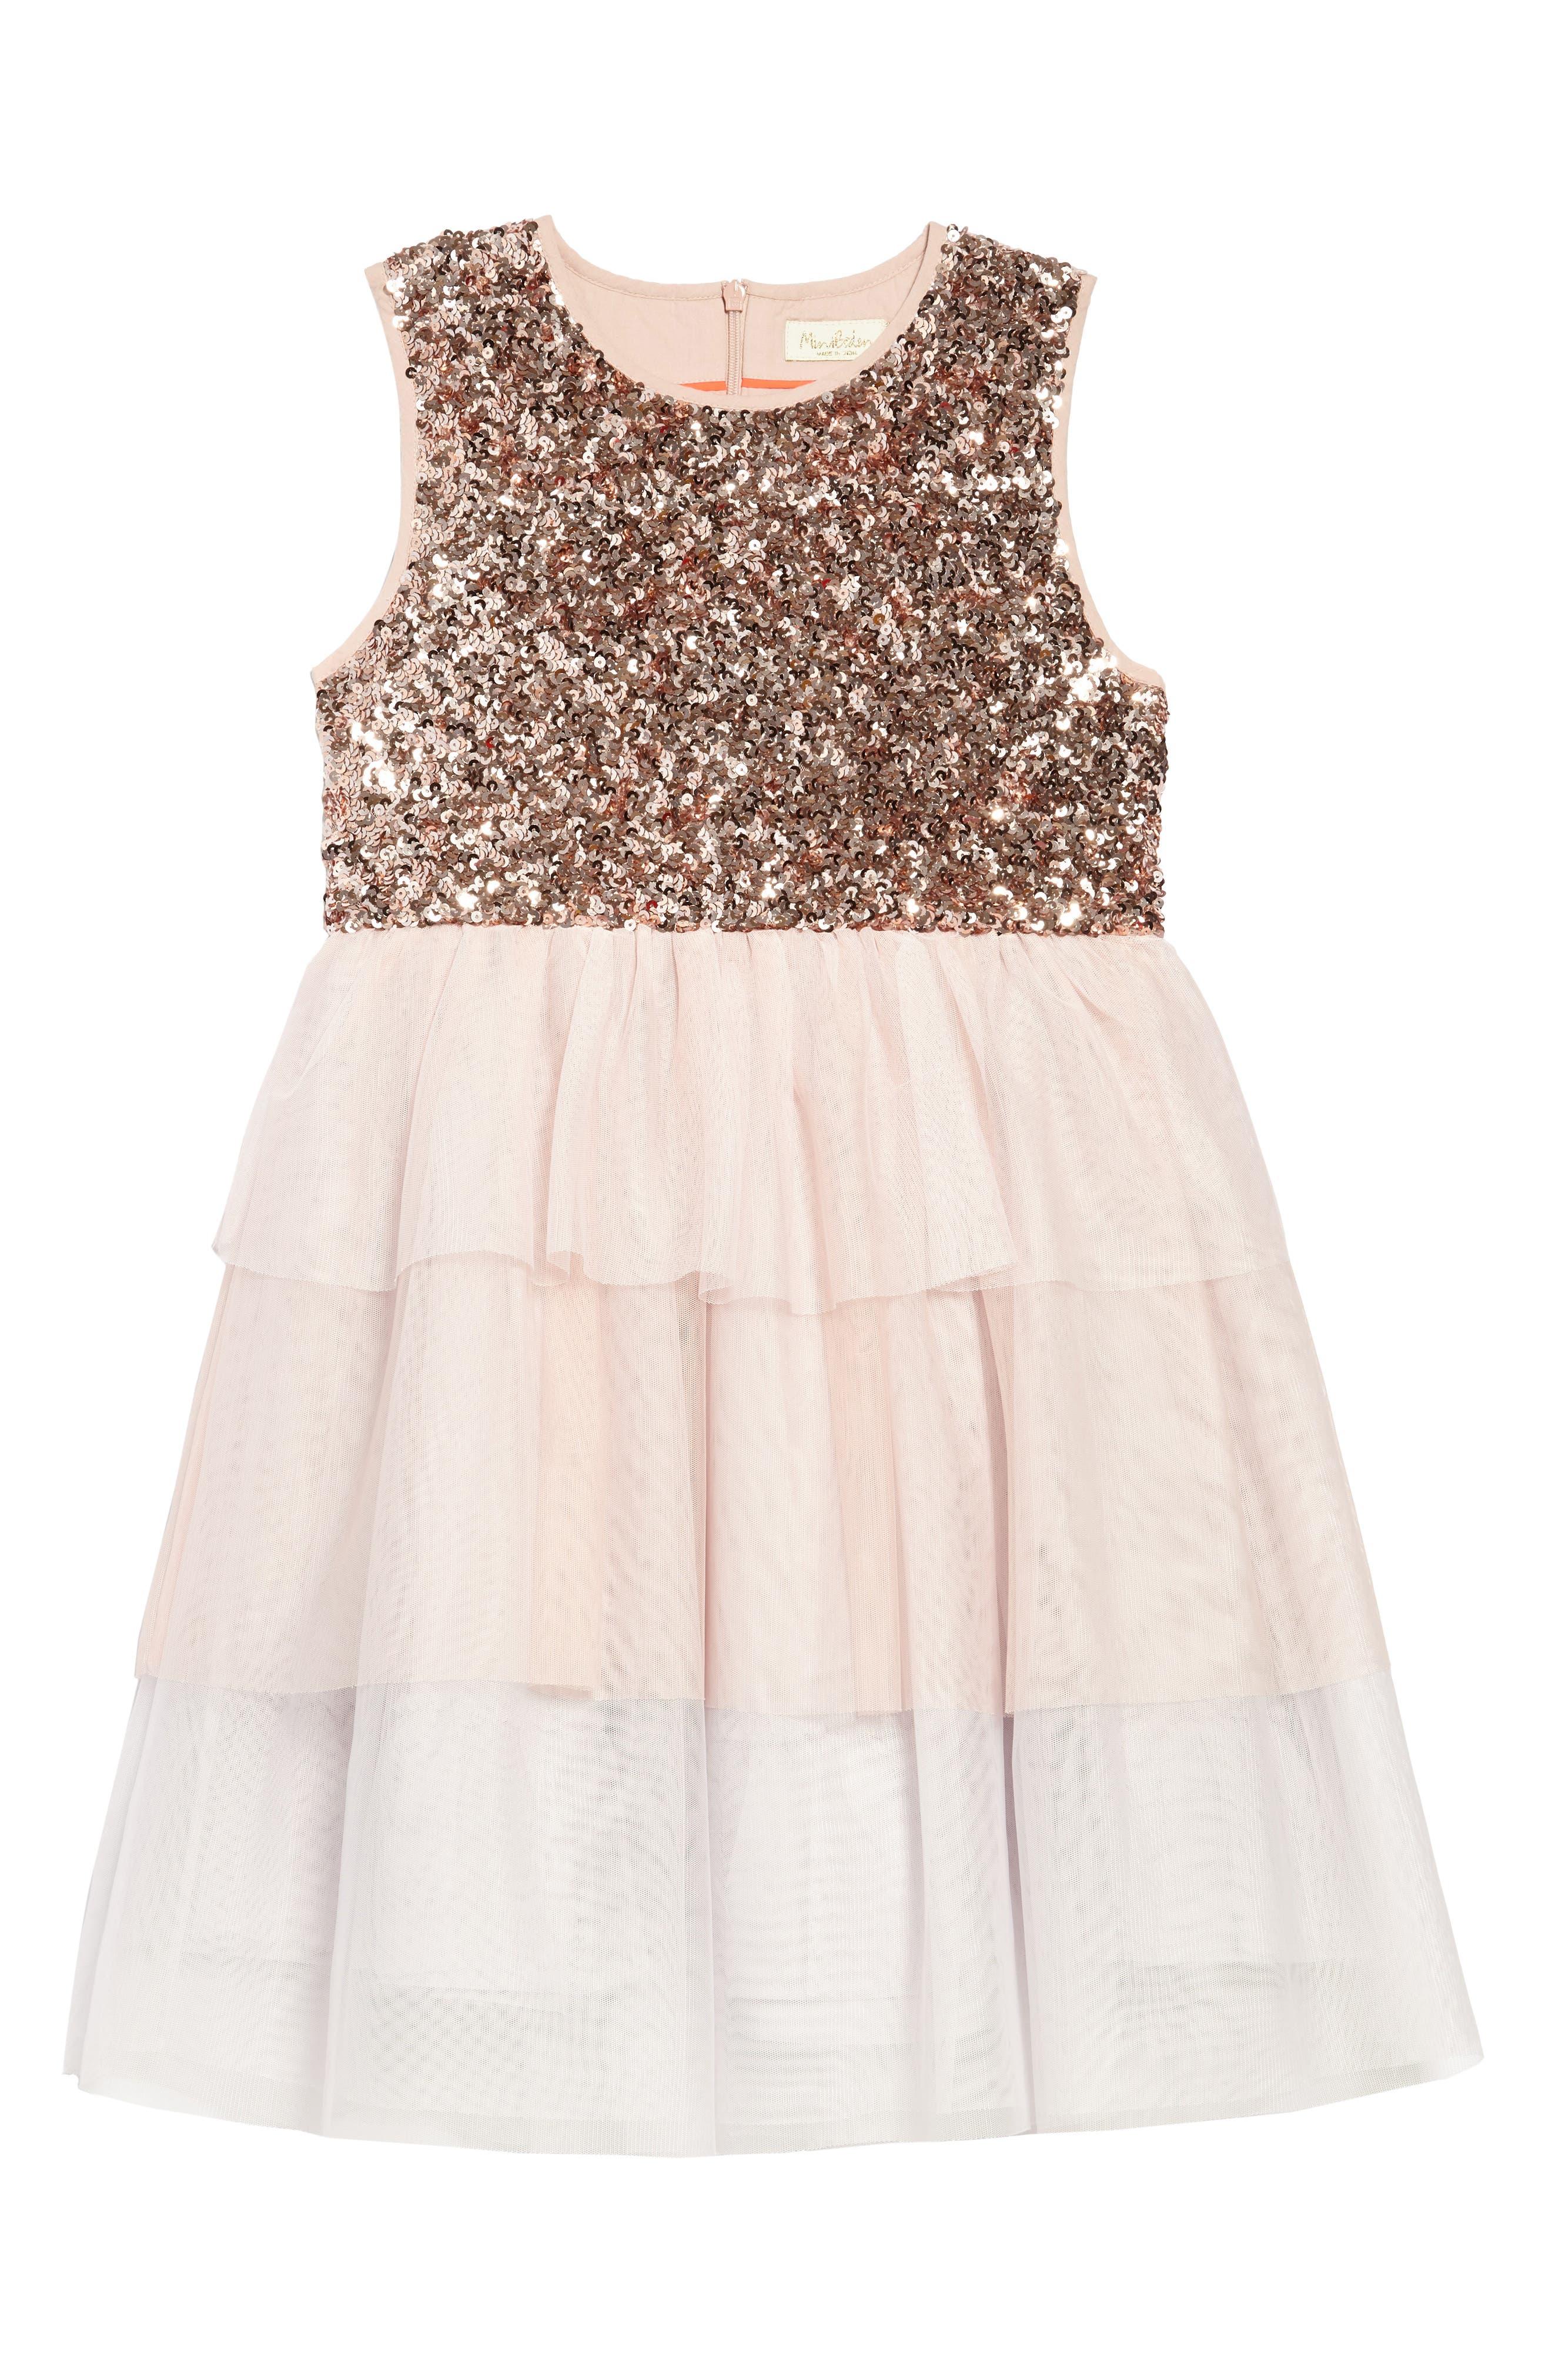 Sequin Tiered Tutu Dress,                             Main thumbnail 1, color,                             684